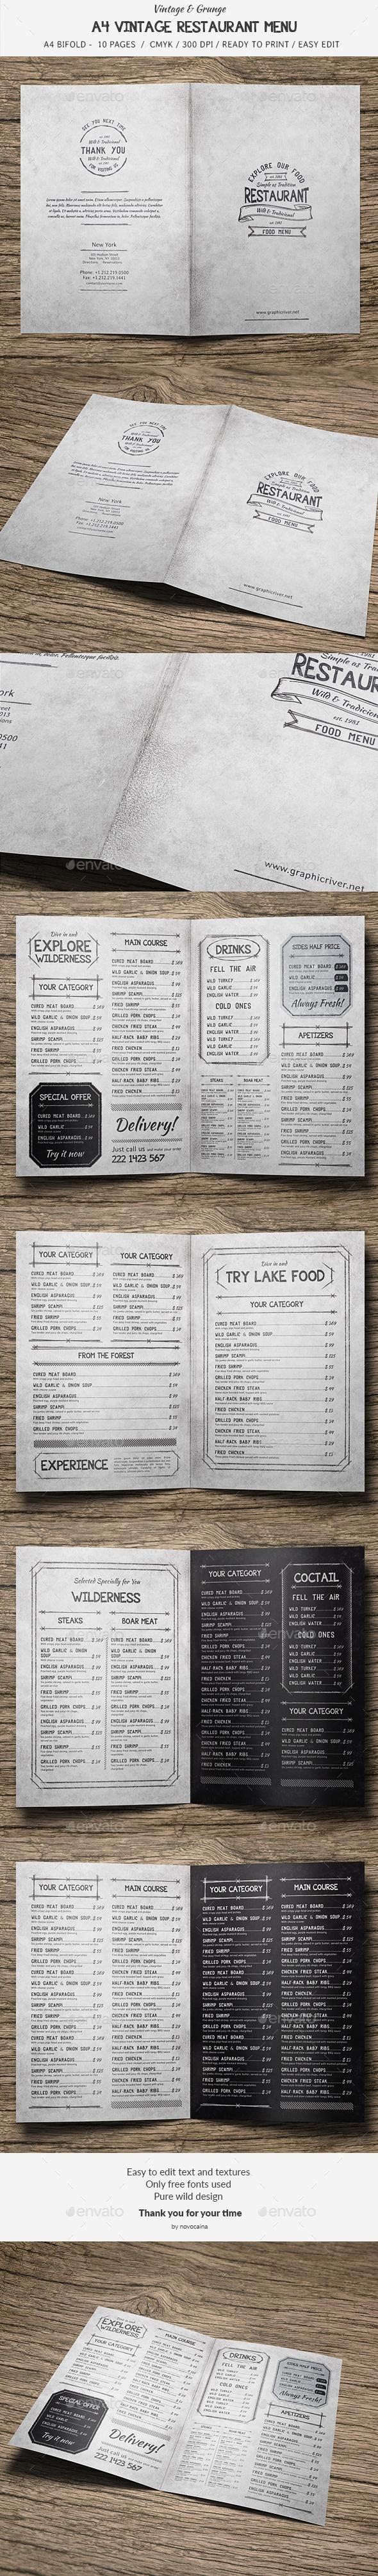 A4 BiFold Vintage Menu - 10 Pages - Food Menus Print Templates